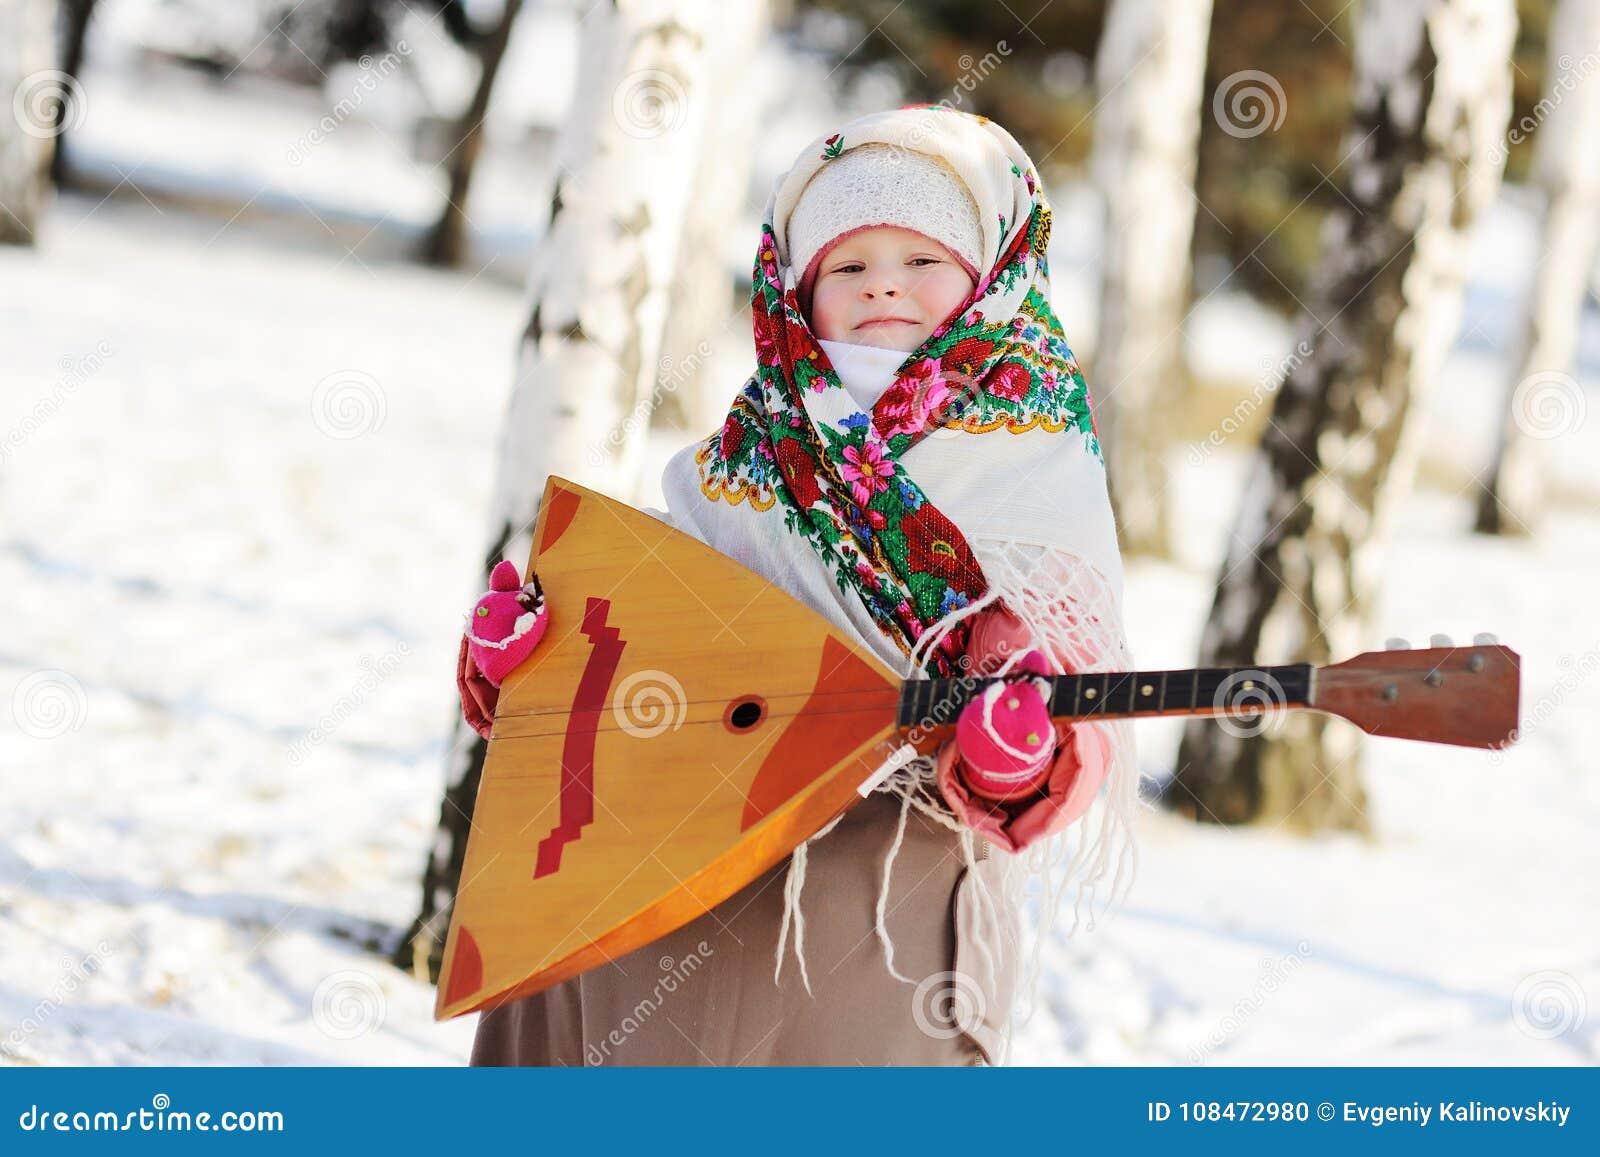 В русском лесу девушки фото — img 11